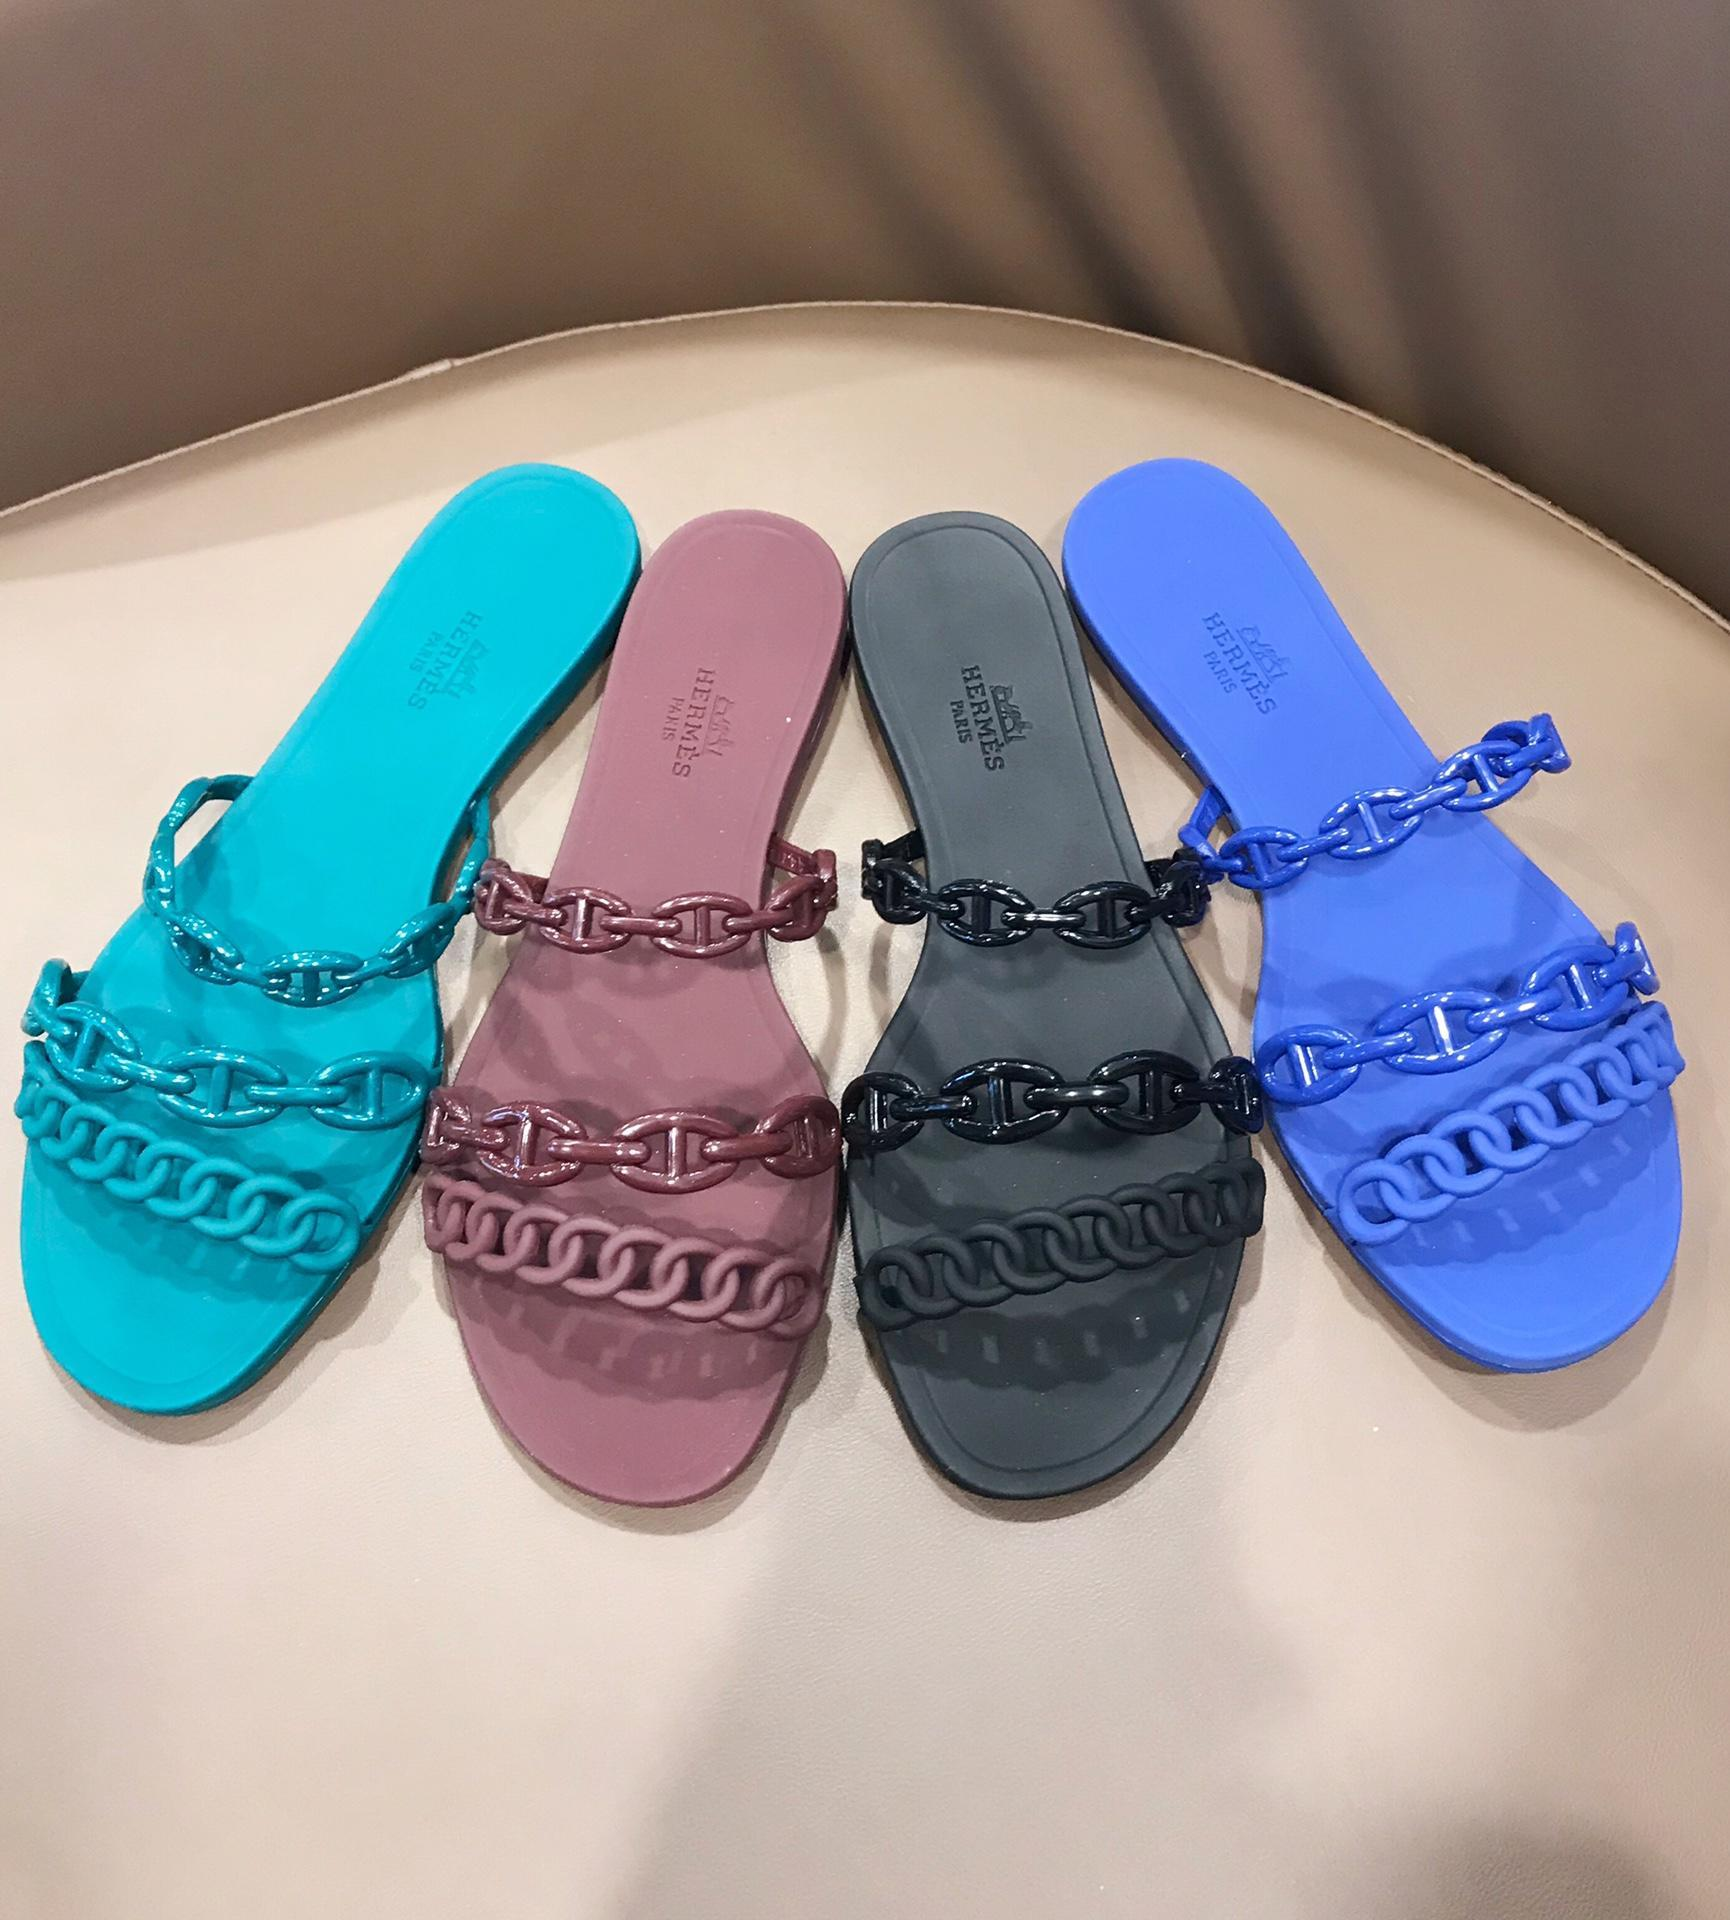 jelly slides shoes Women Jelly Sandals flat slipper        slides        1